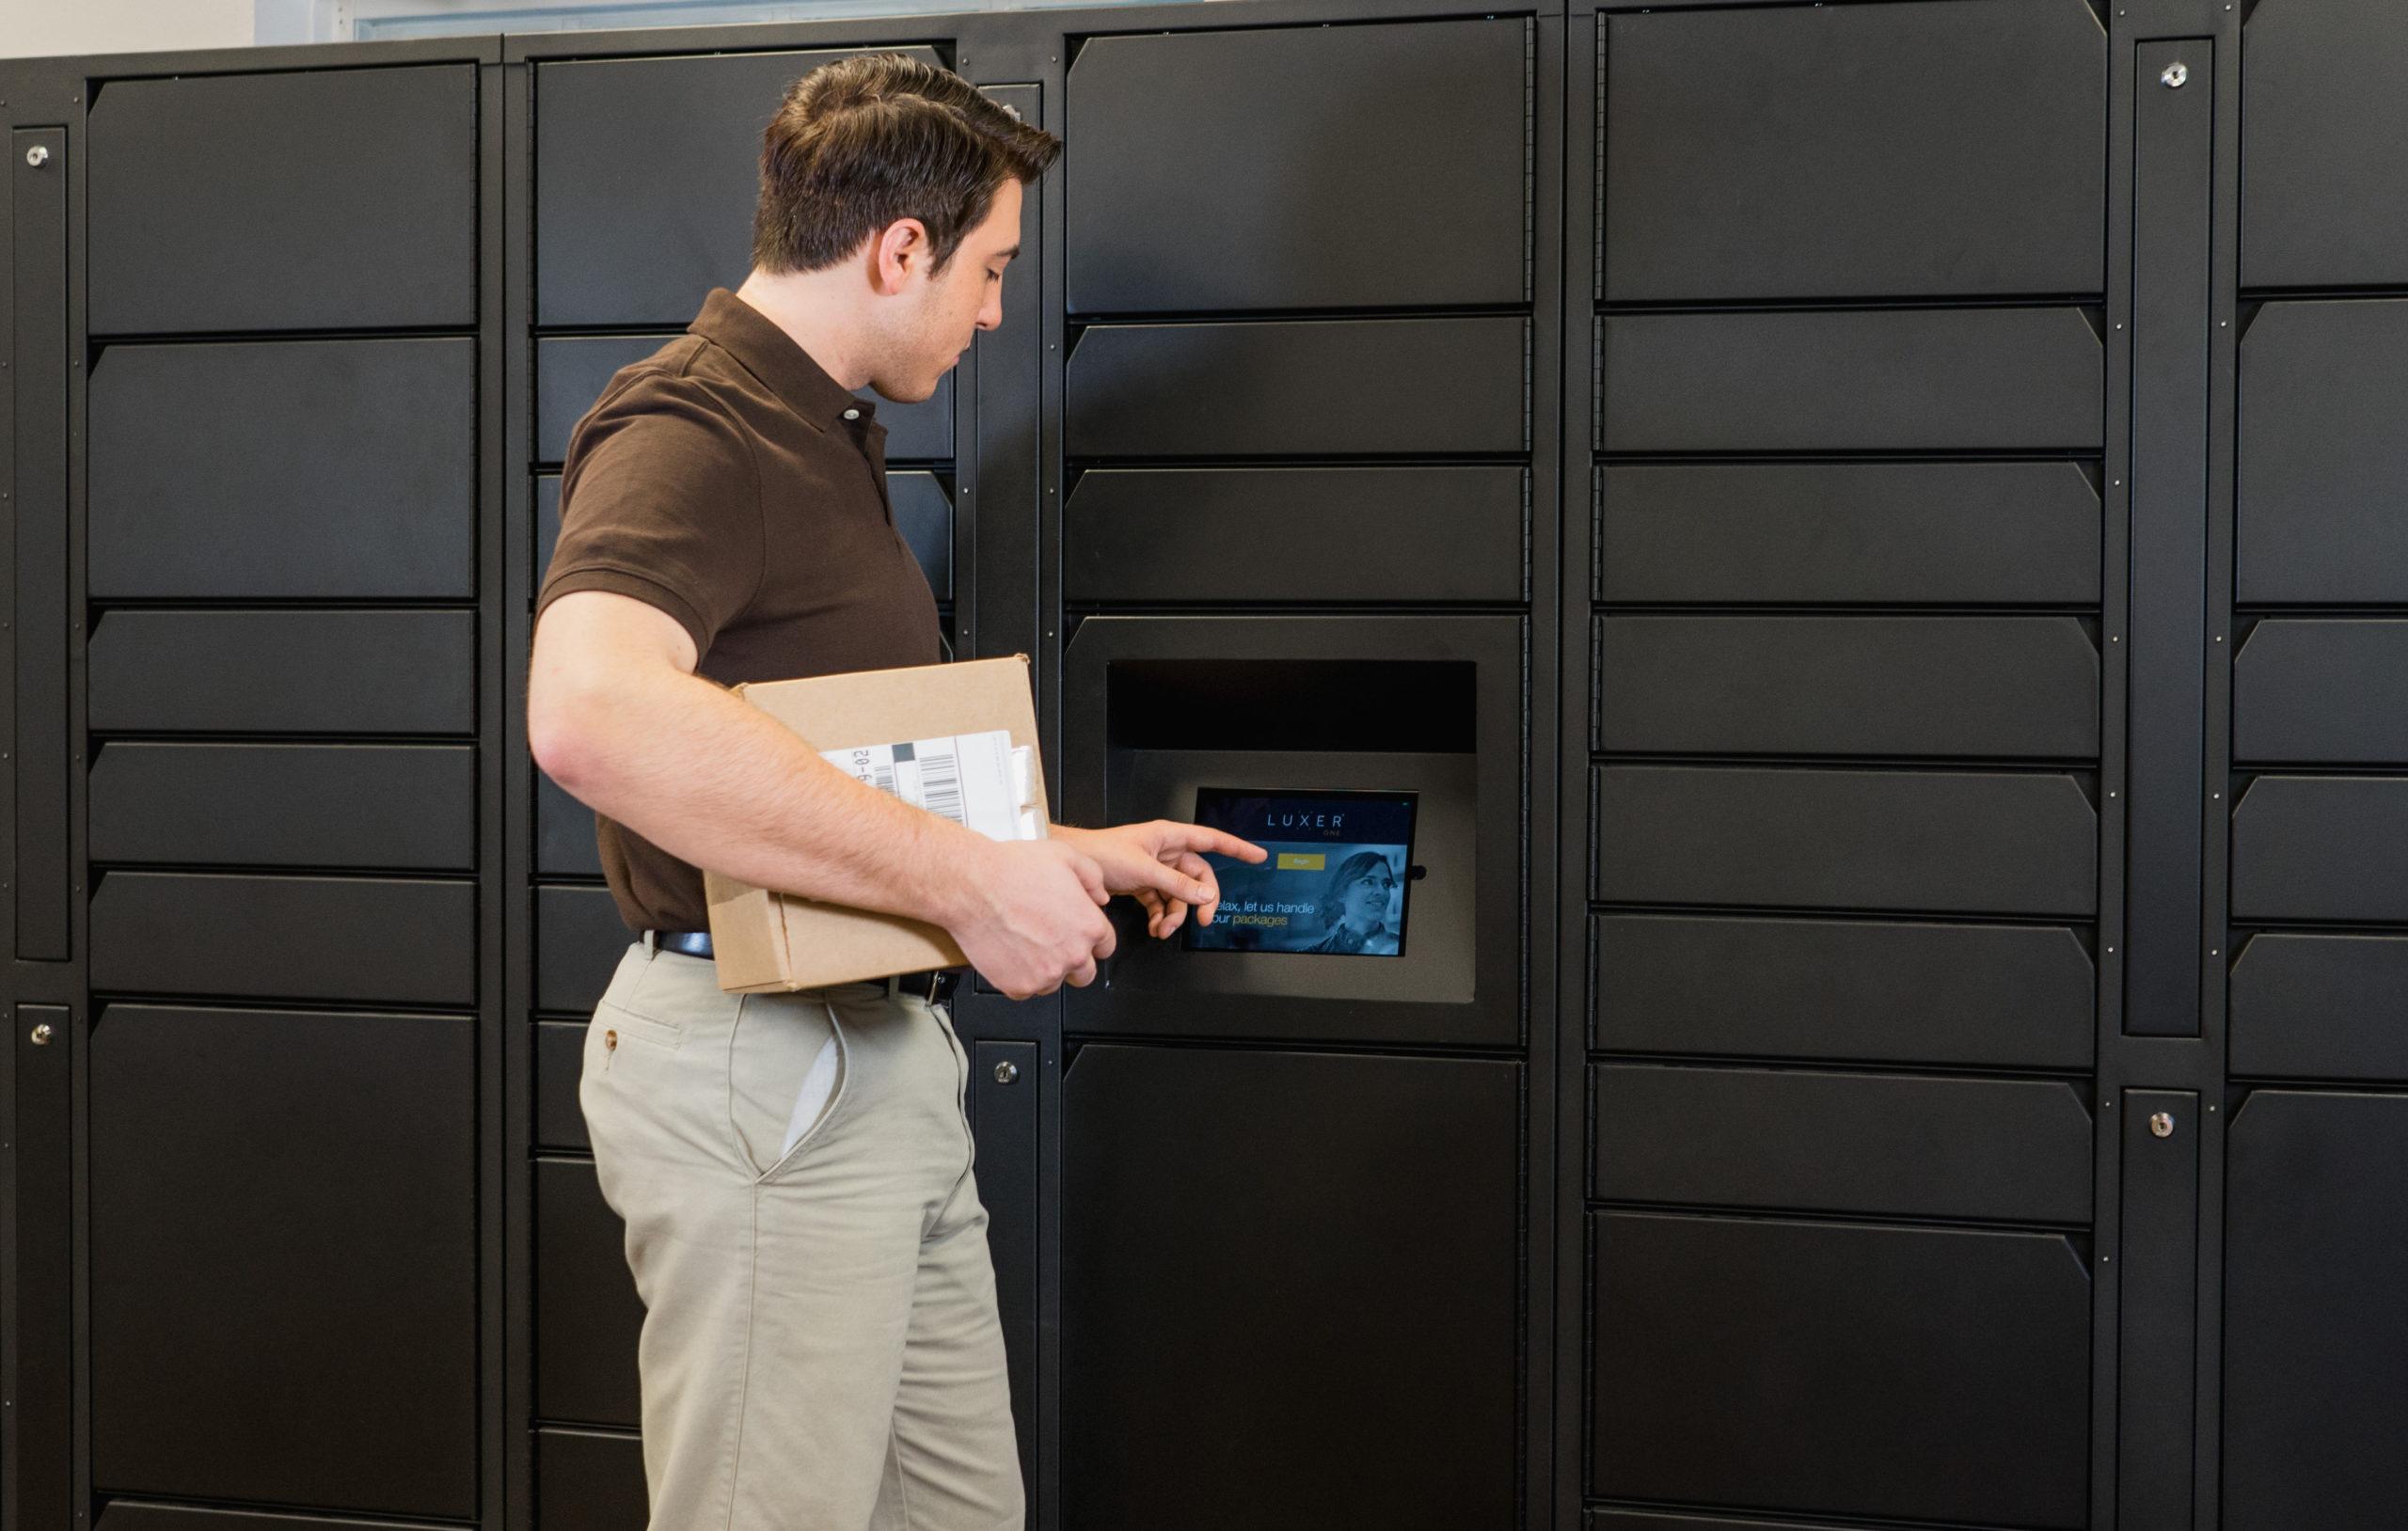 Luxer One Parcel Locker Carrier Using LCD